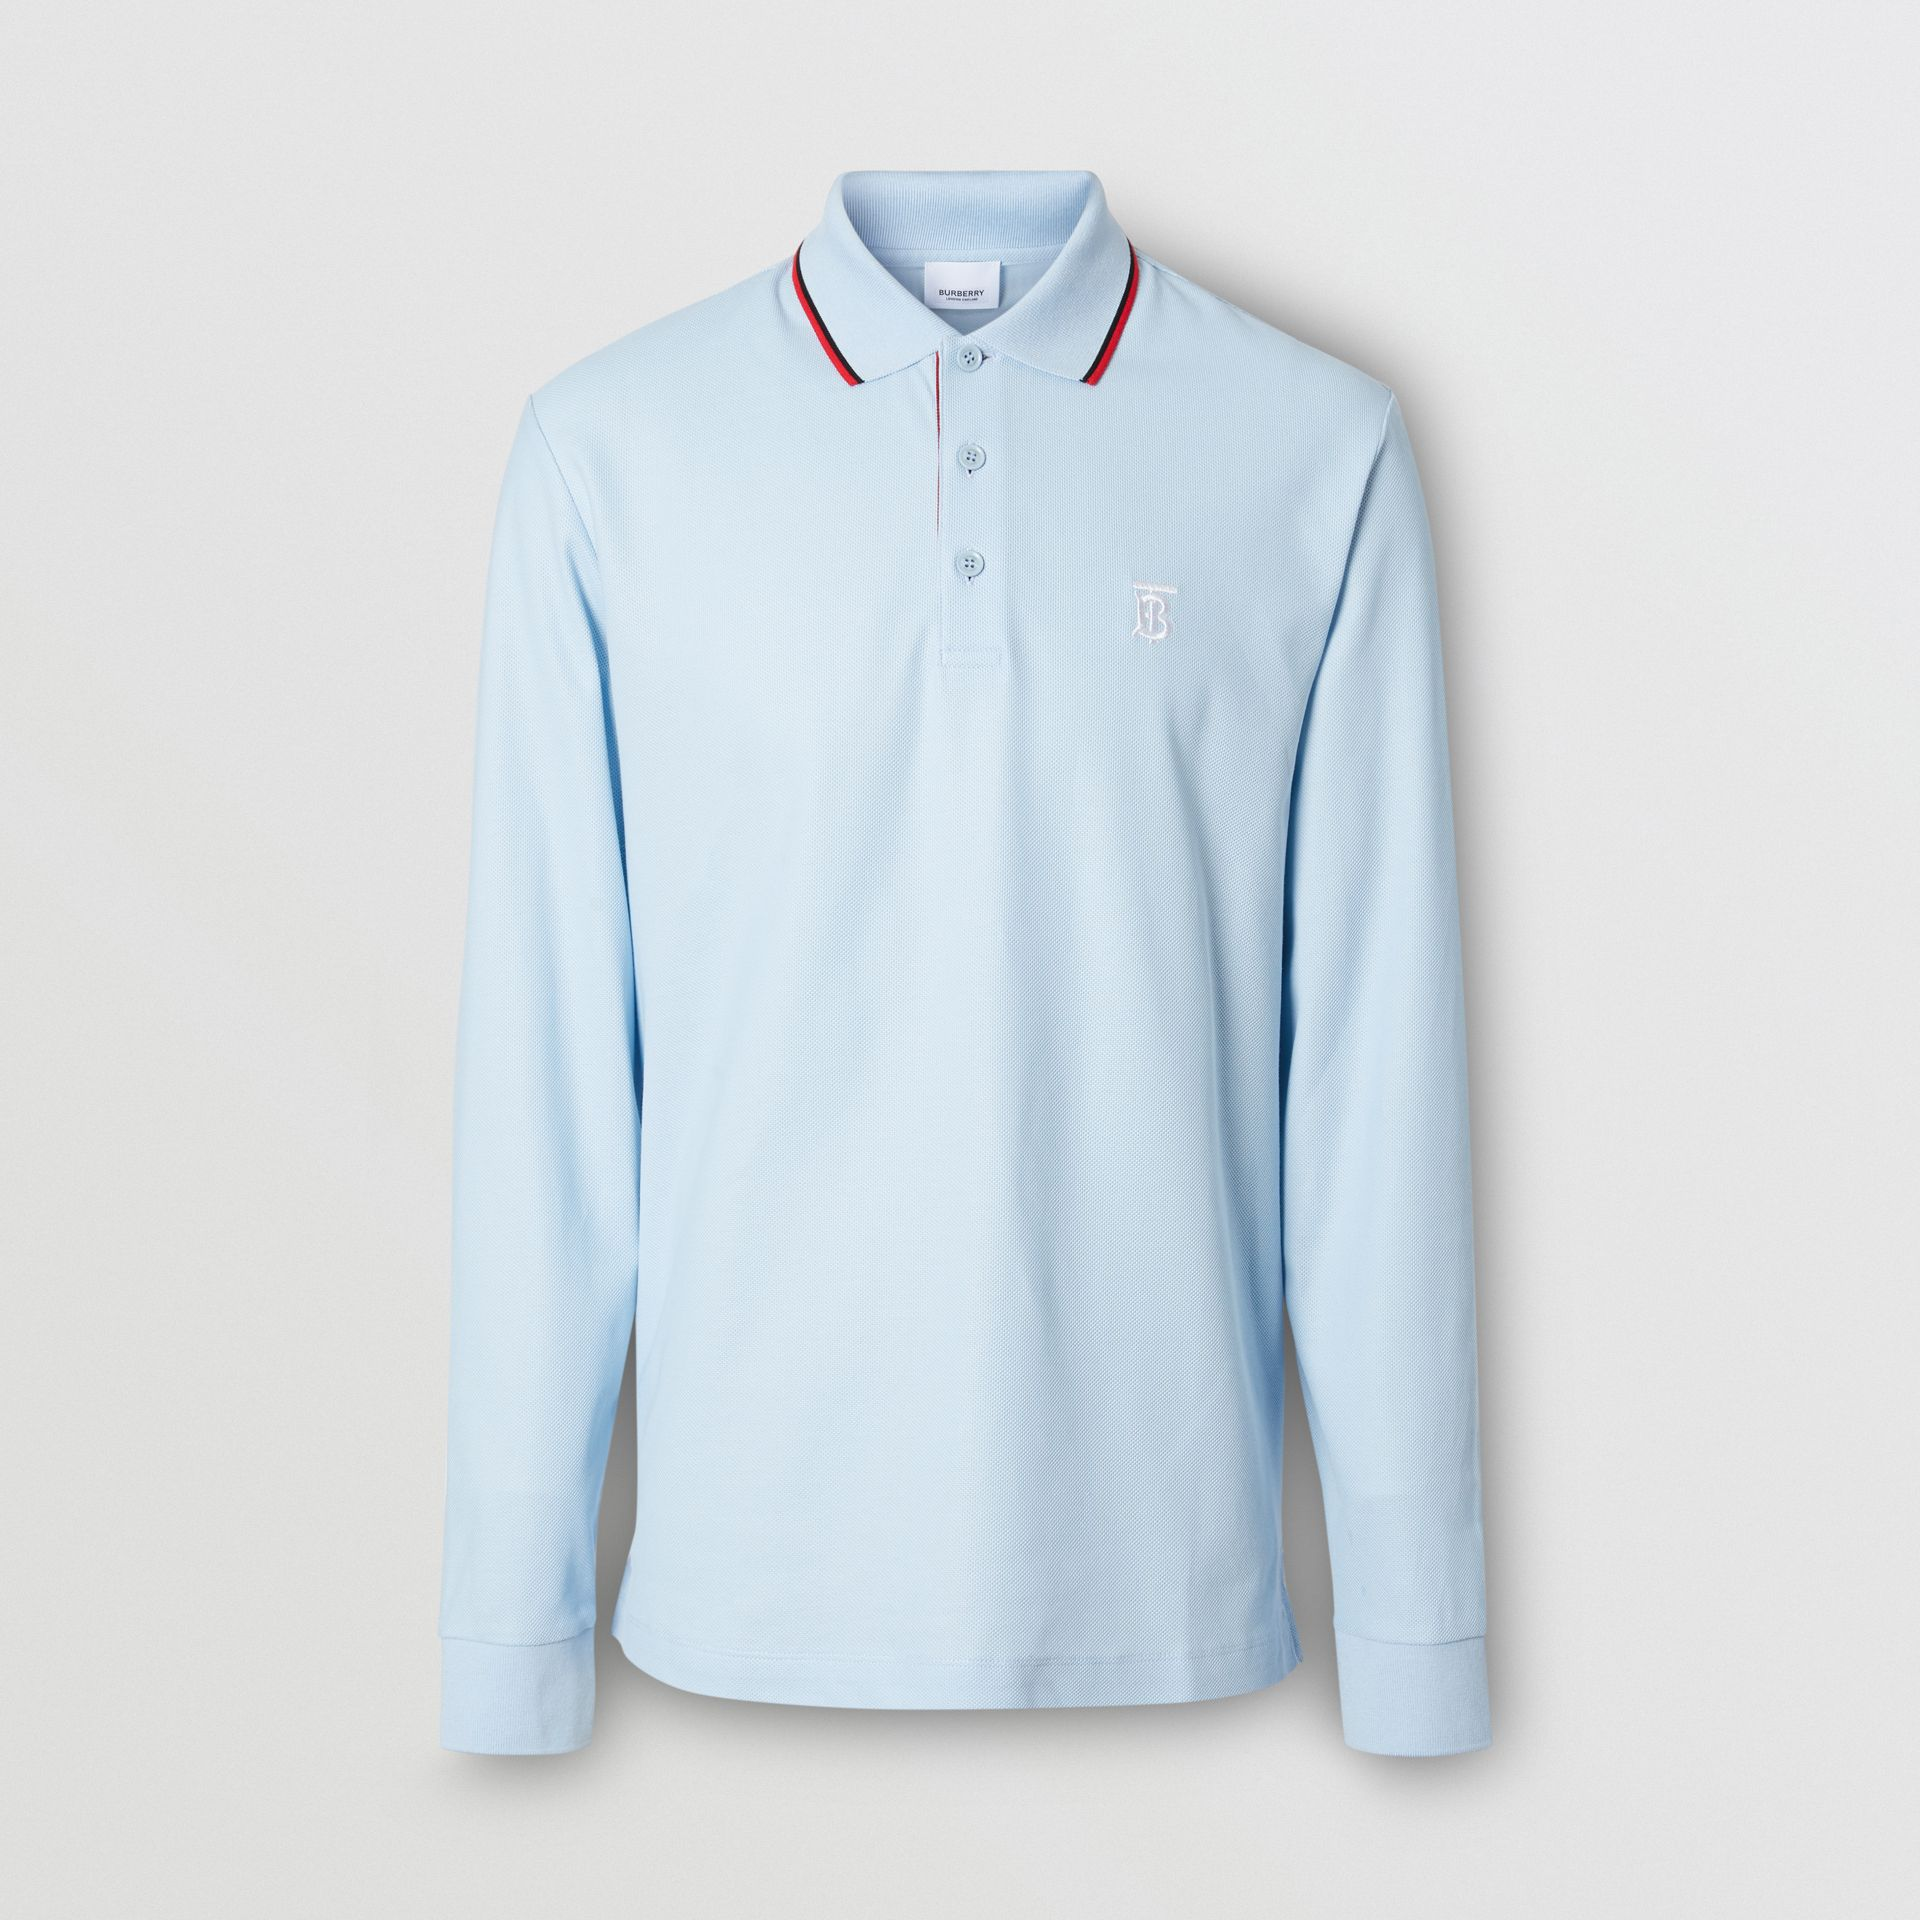 Long-sleeve Monogram Motif Cotton Piqué Polo Shirt in Pale Blue - Men | Burberry - gallery image 0